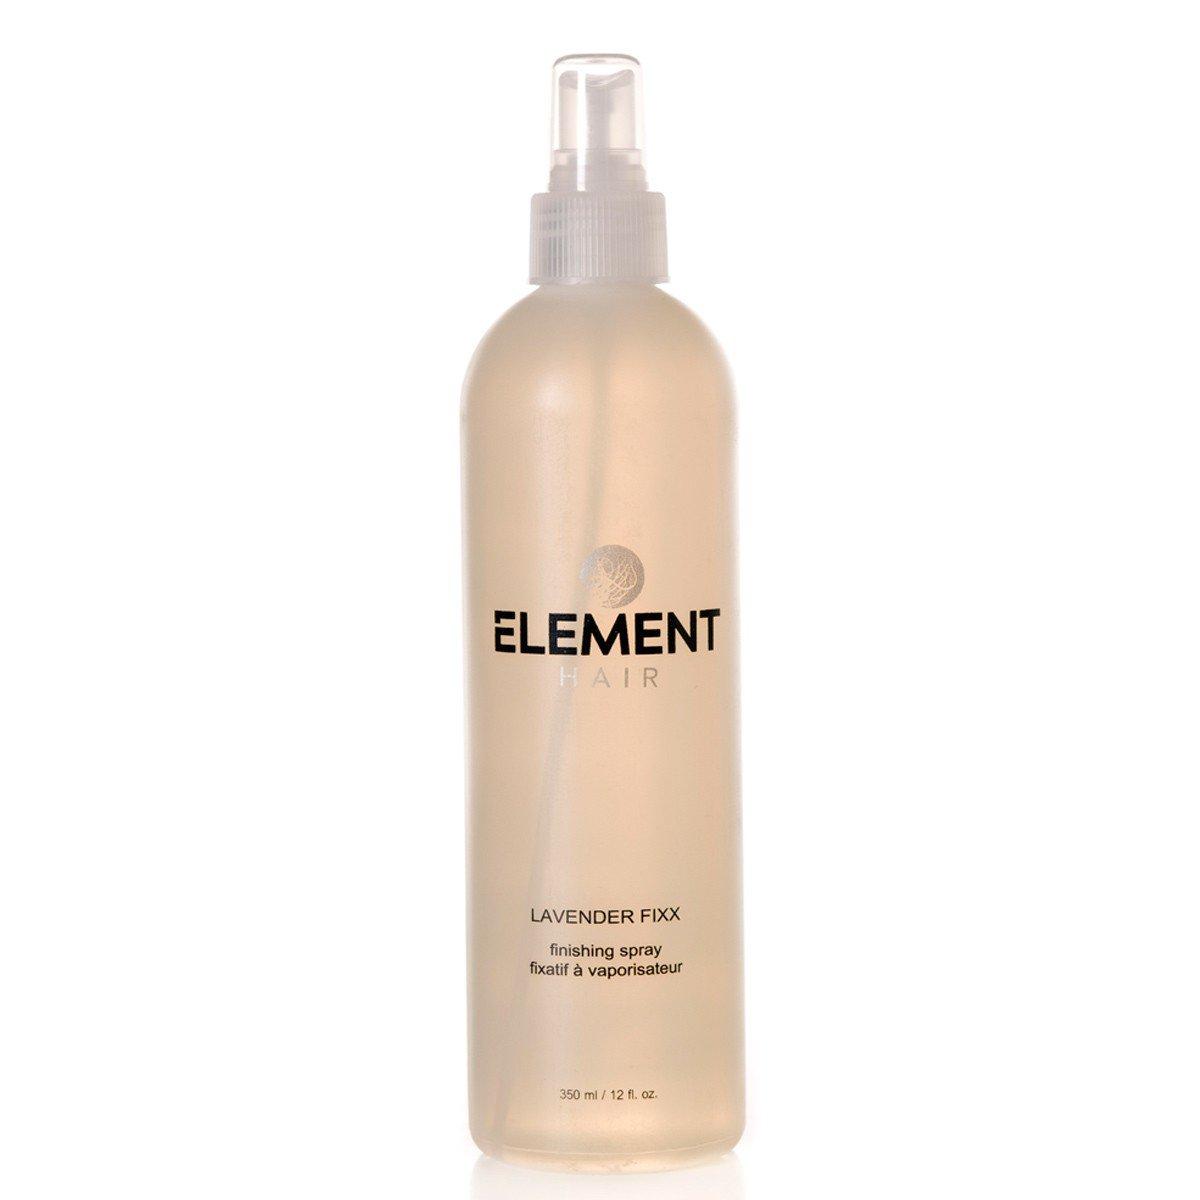 Lavender Fixx hairspray finishing spray